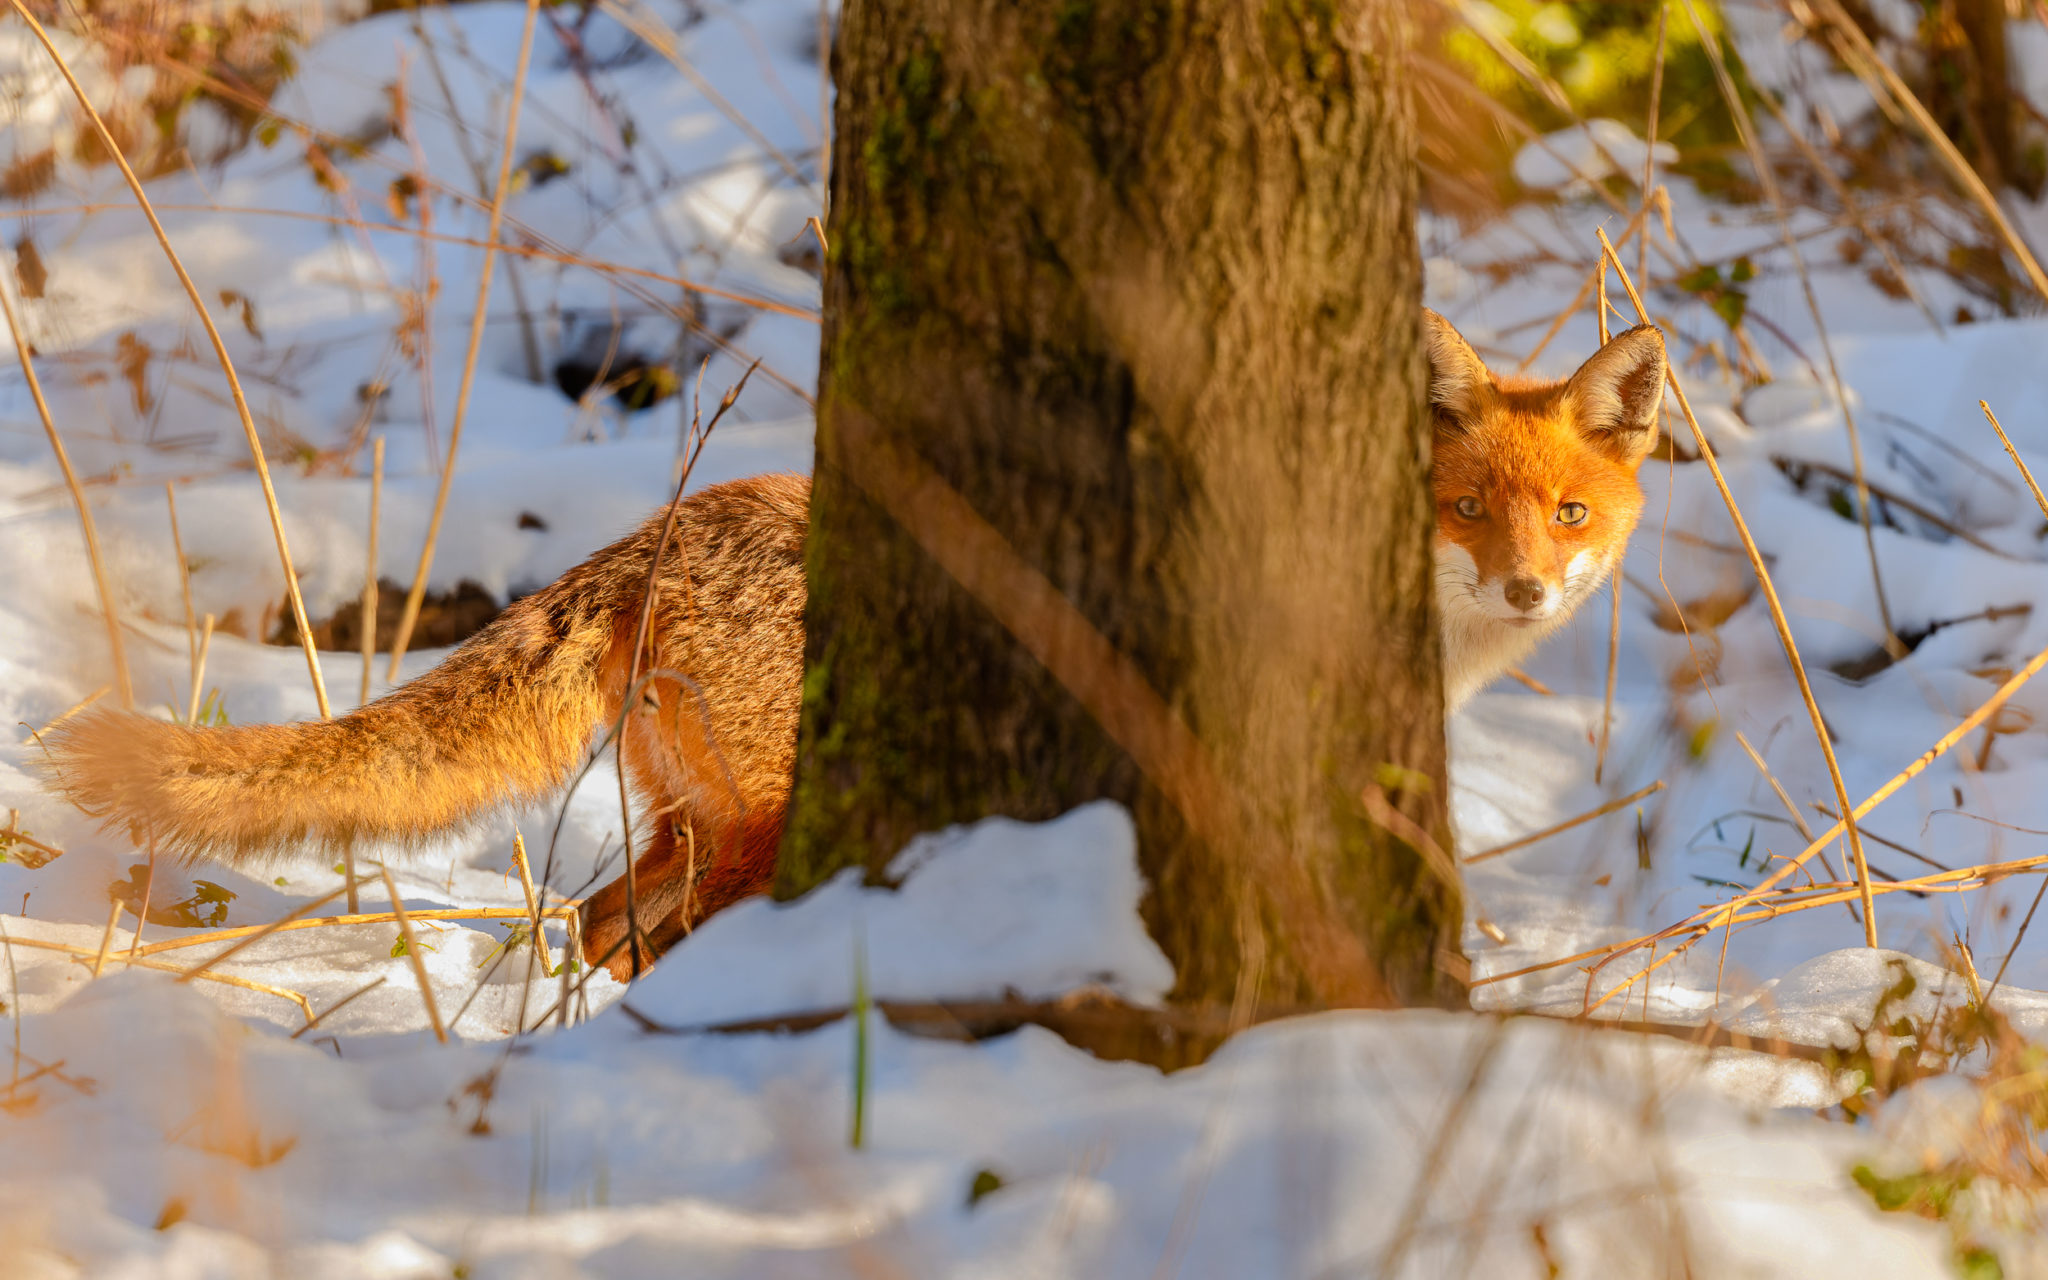 Rotfuchs (Vulpes vulpes), Naturfotografie Olaf & Sylvia Rentzsch